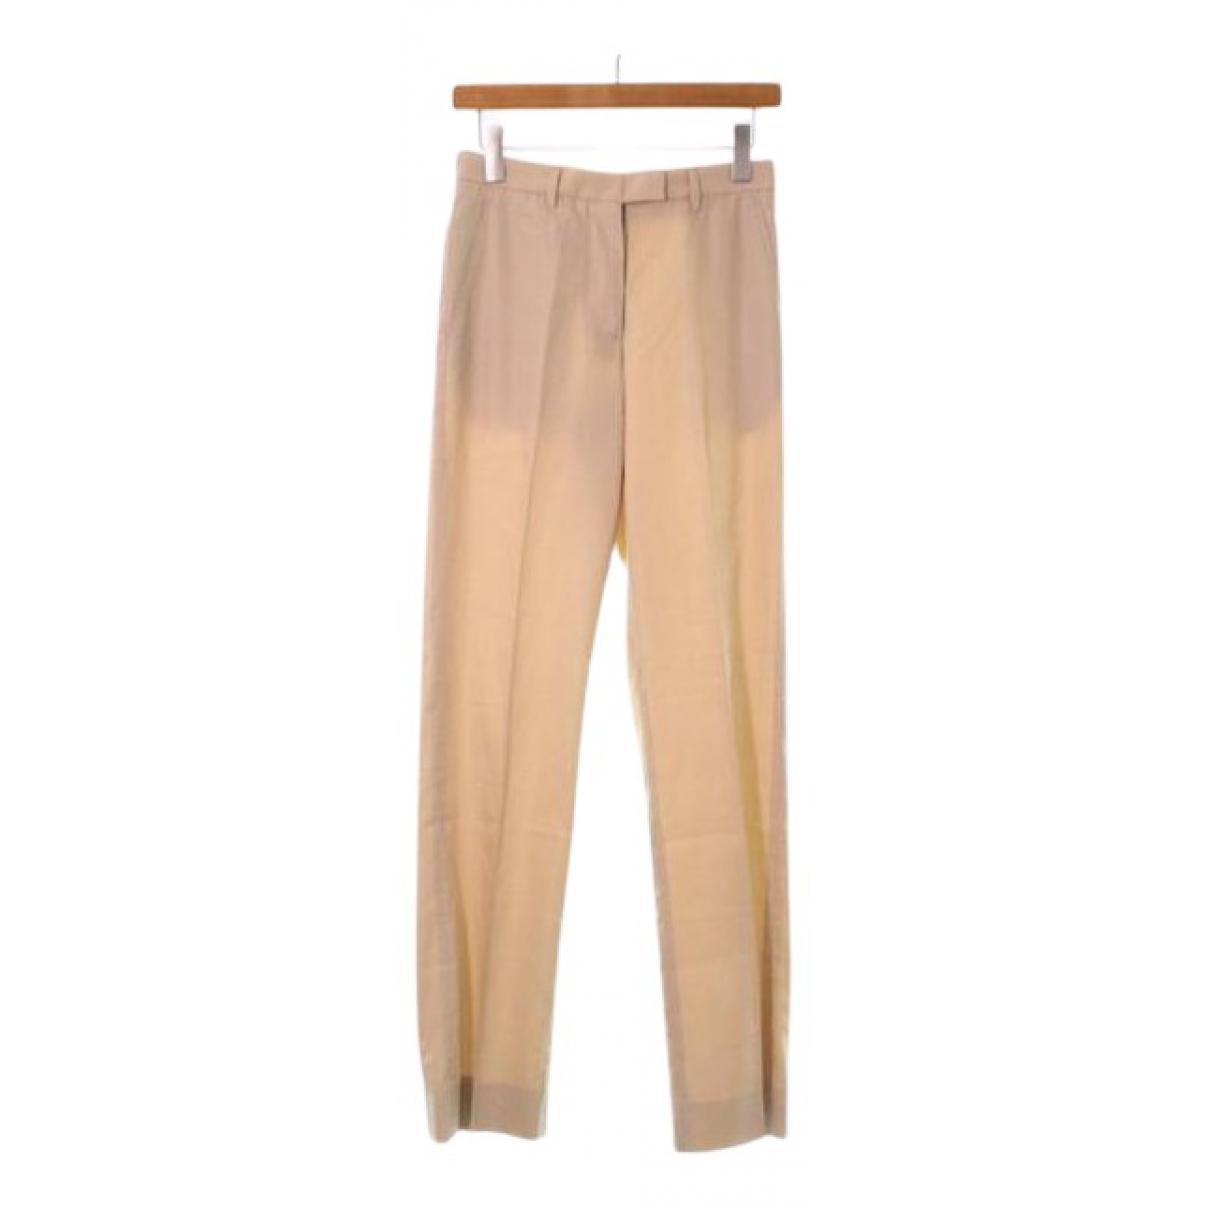 Maison Martin Margiela N Beige Cotton Trousers for Women 36 IT